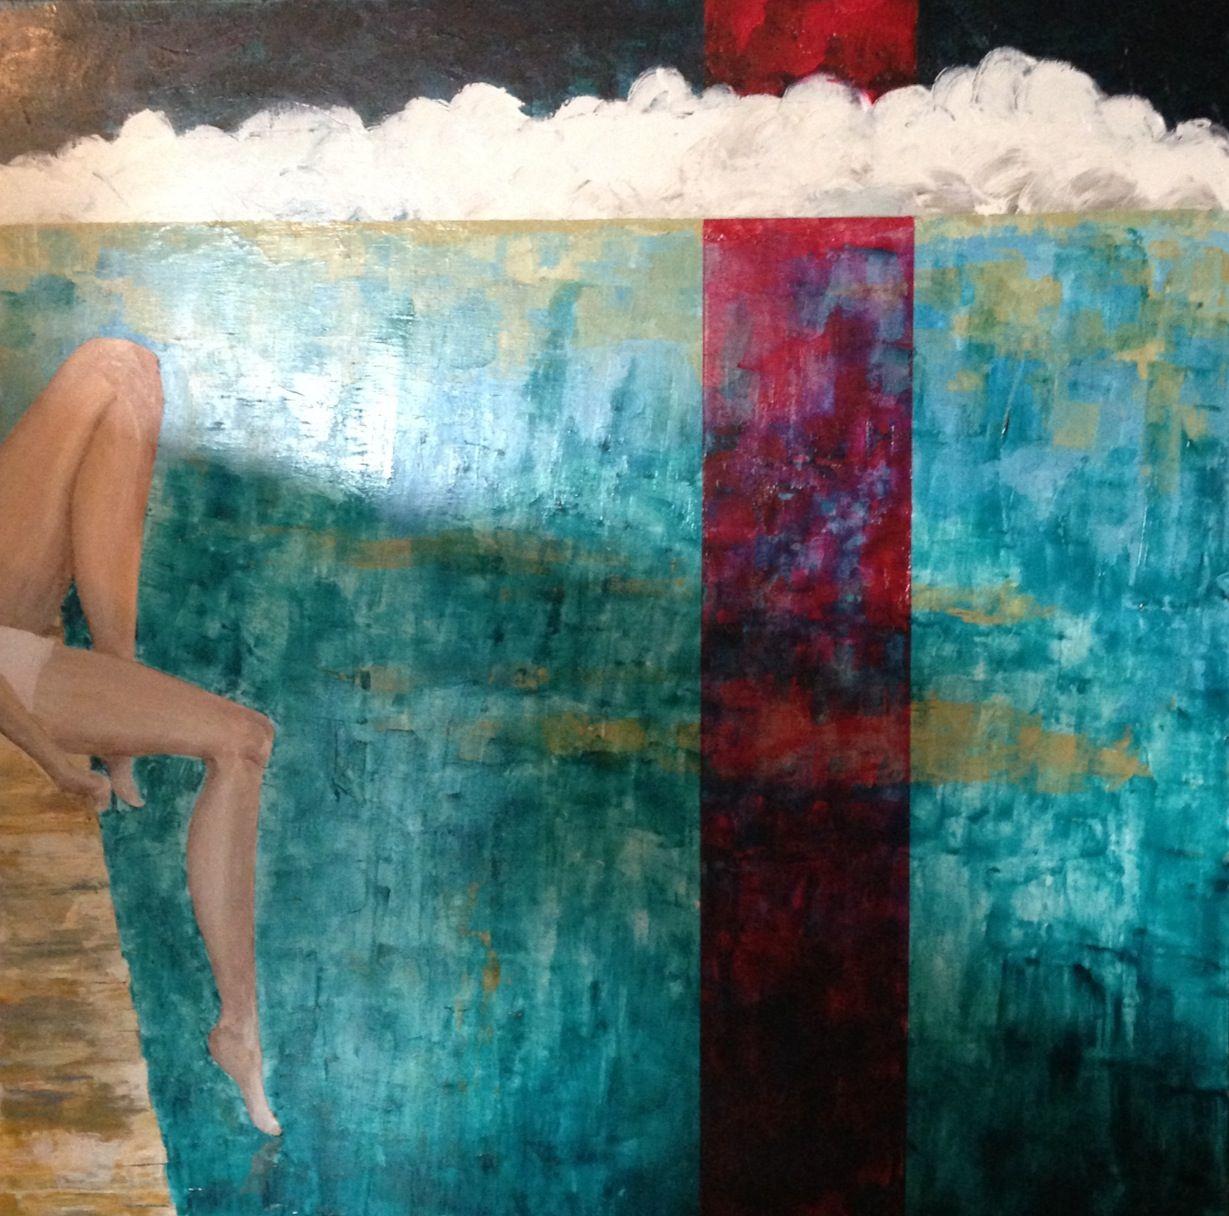 Joey 36x36 acrylic on canvas